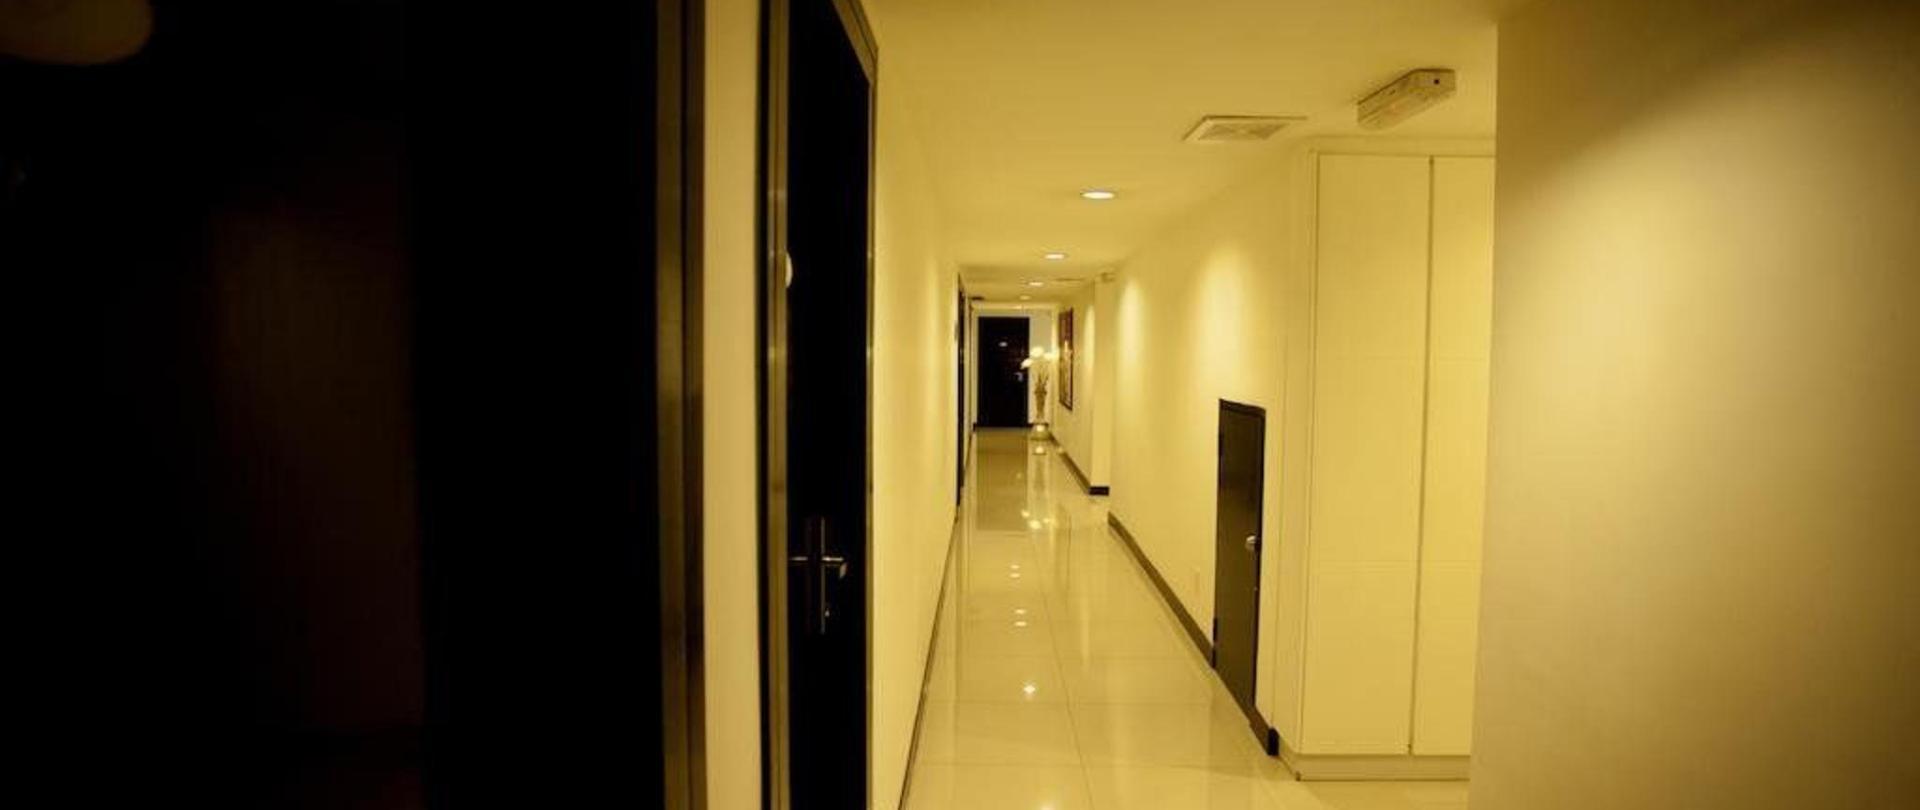 interior-view6.jpg